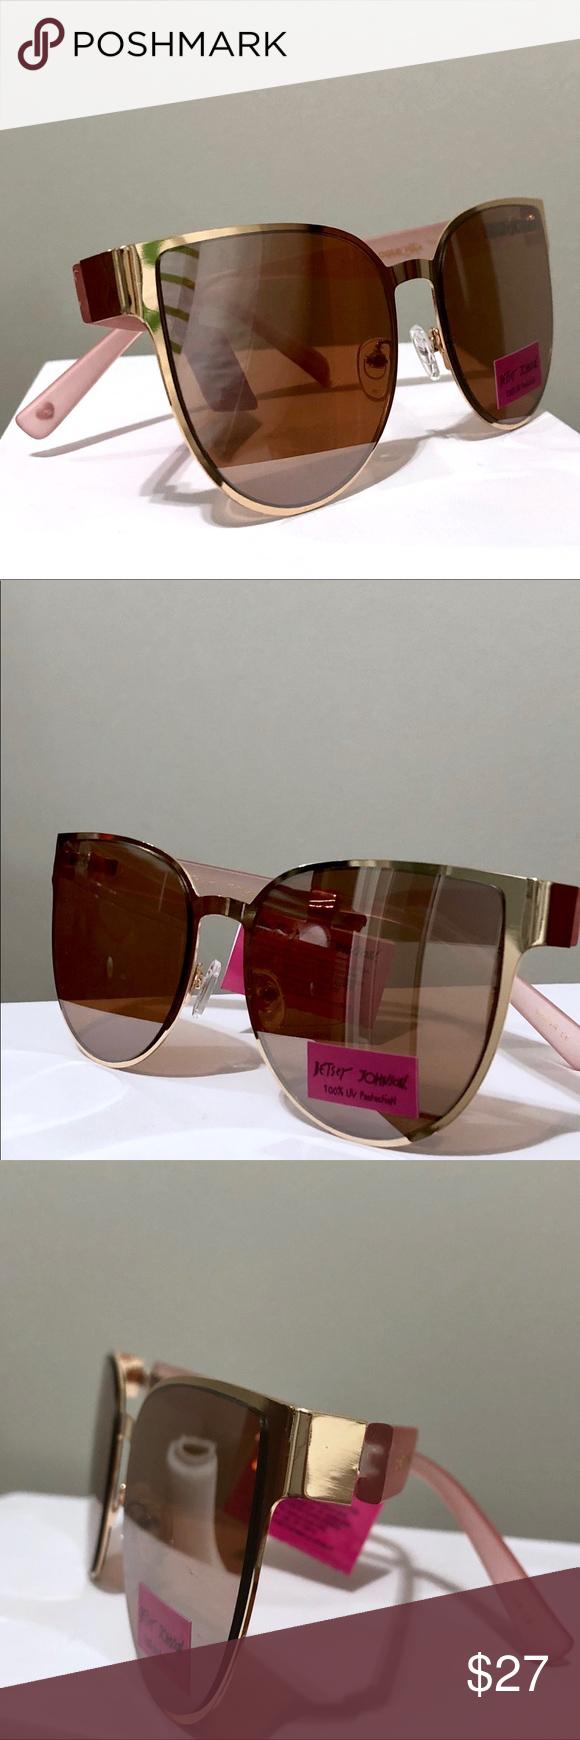 20d4e23d804 Betsey Johnson Cat Eye Sunglasses Betsey Johnson Pink   Gold Metal Cat-Eye  Sunglasses -